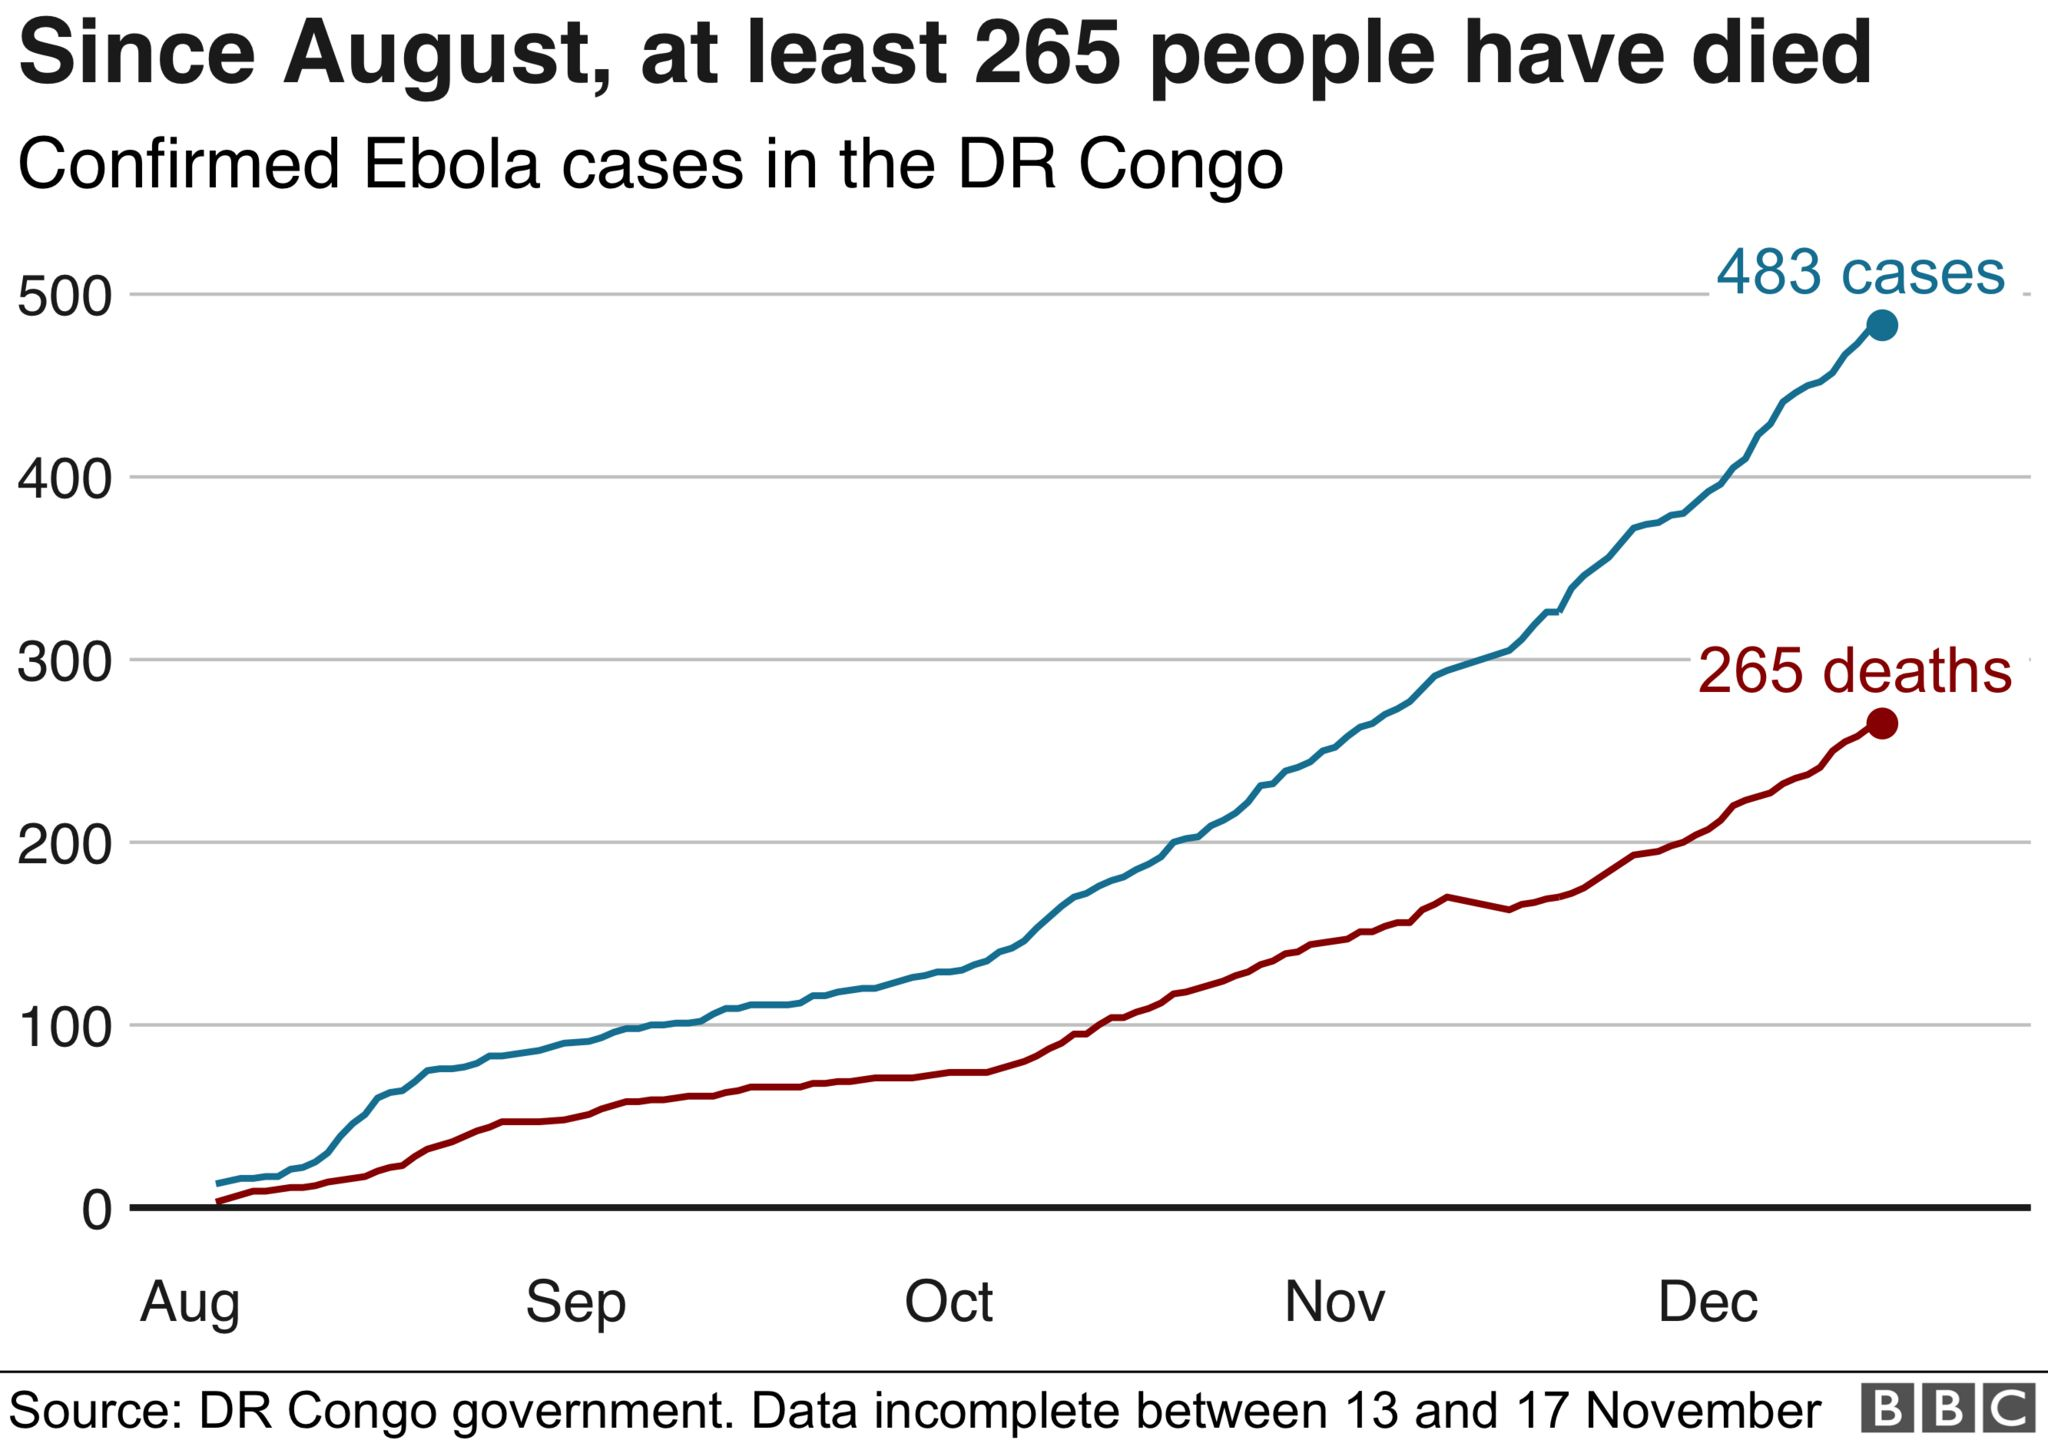 Graph showing Ebola deaths